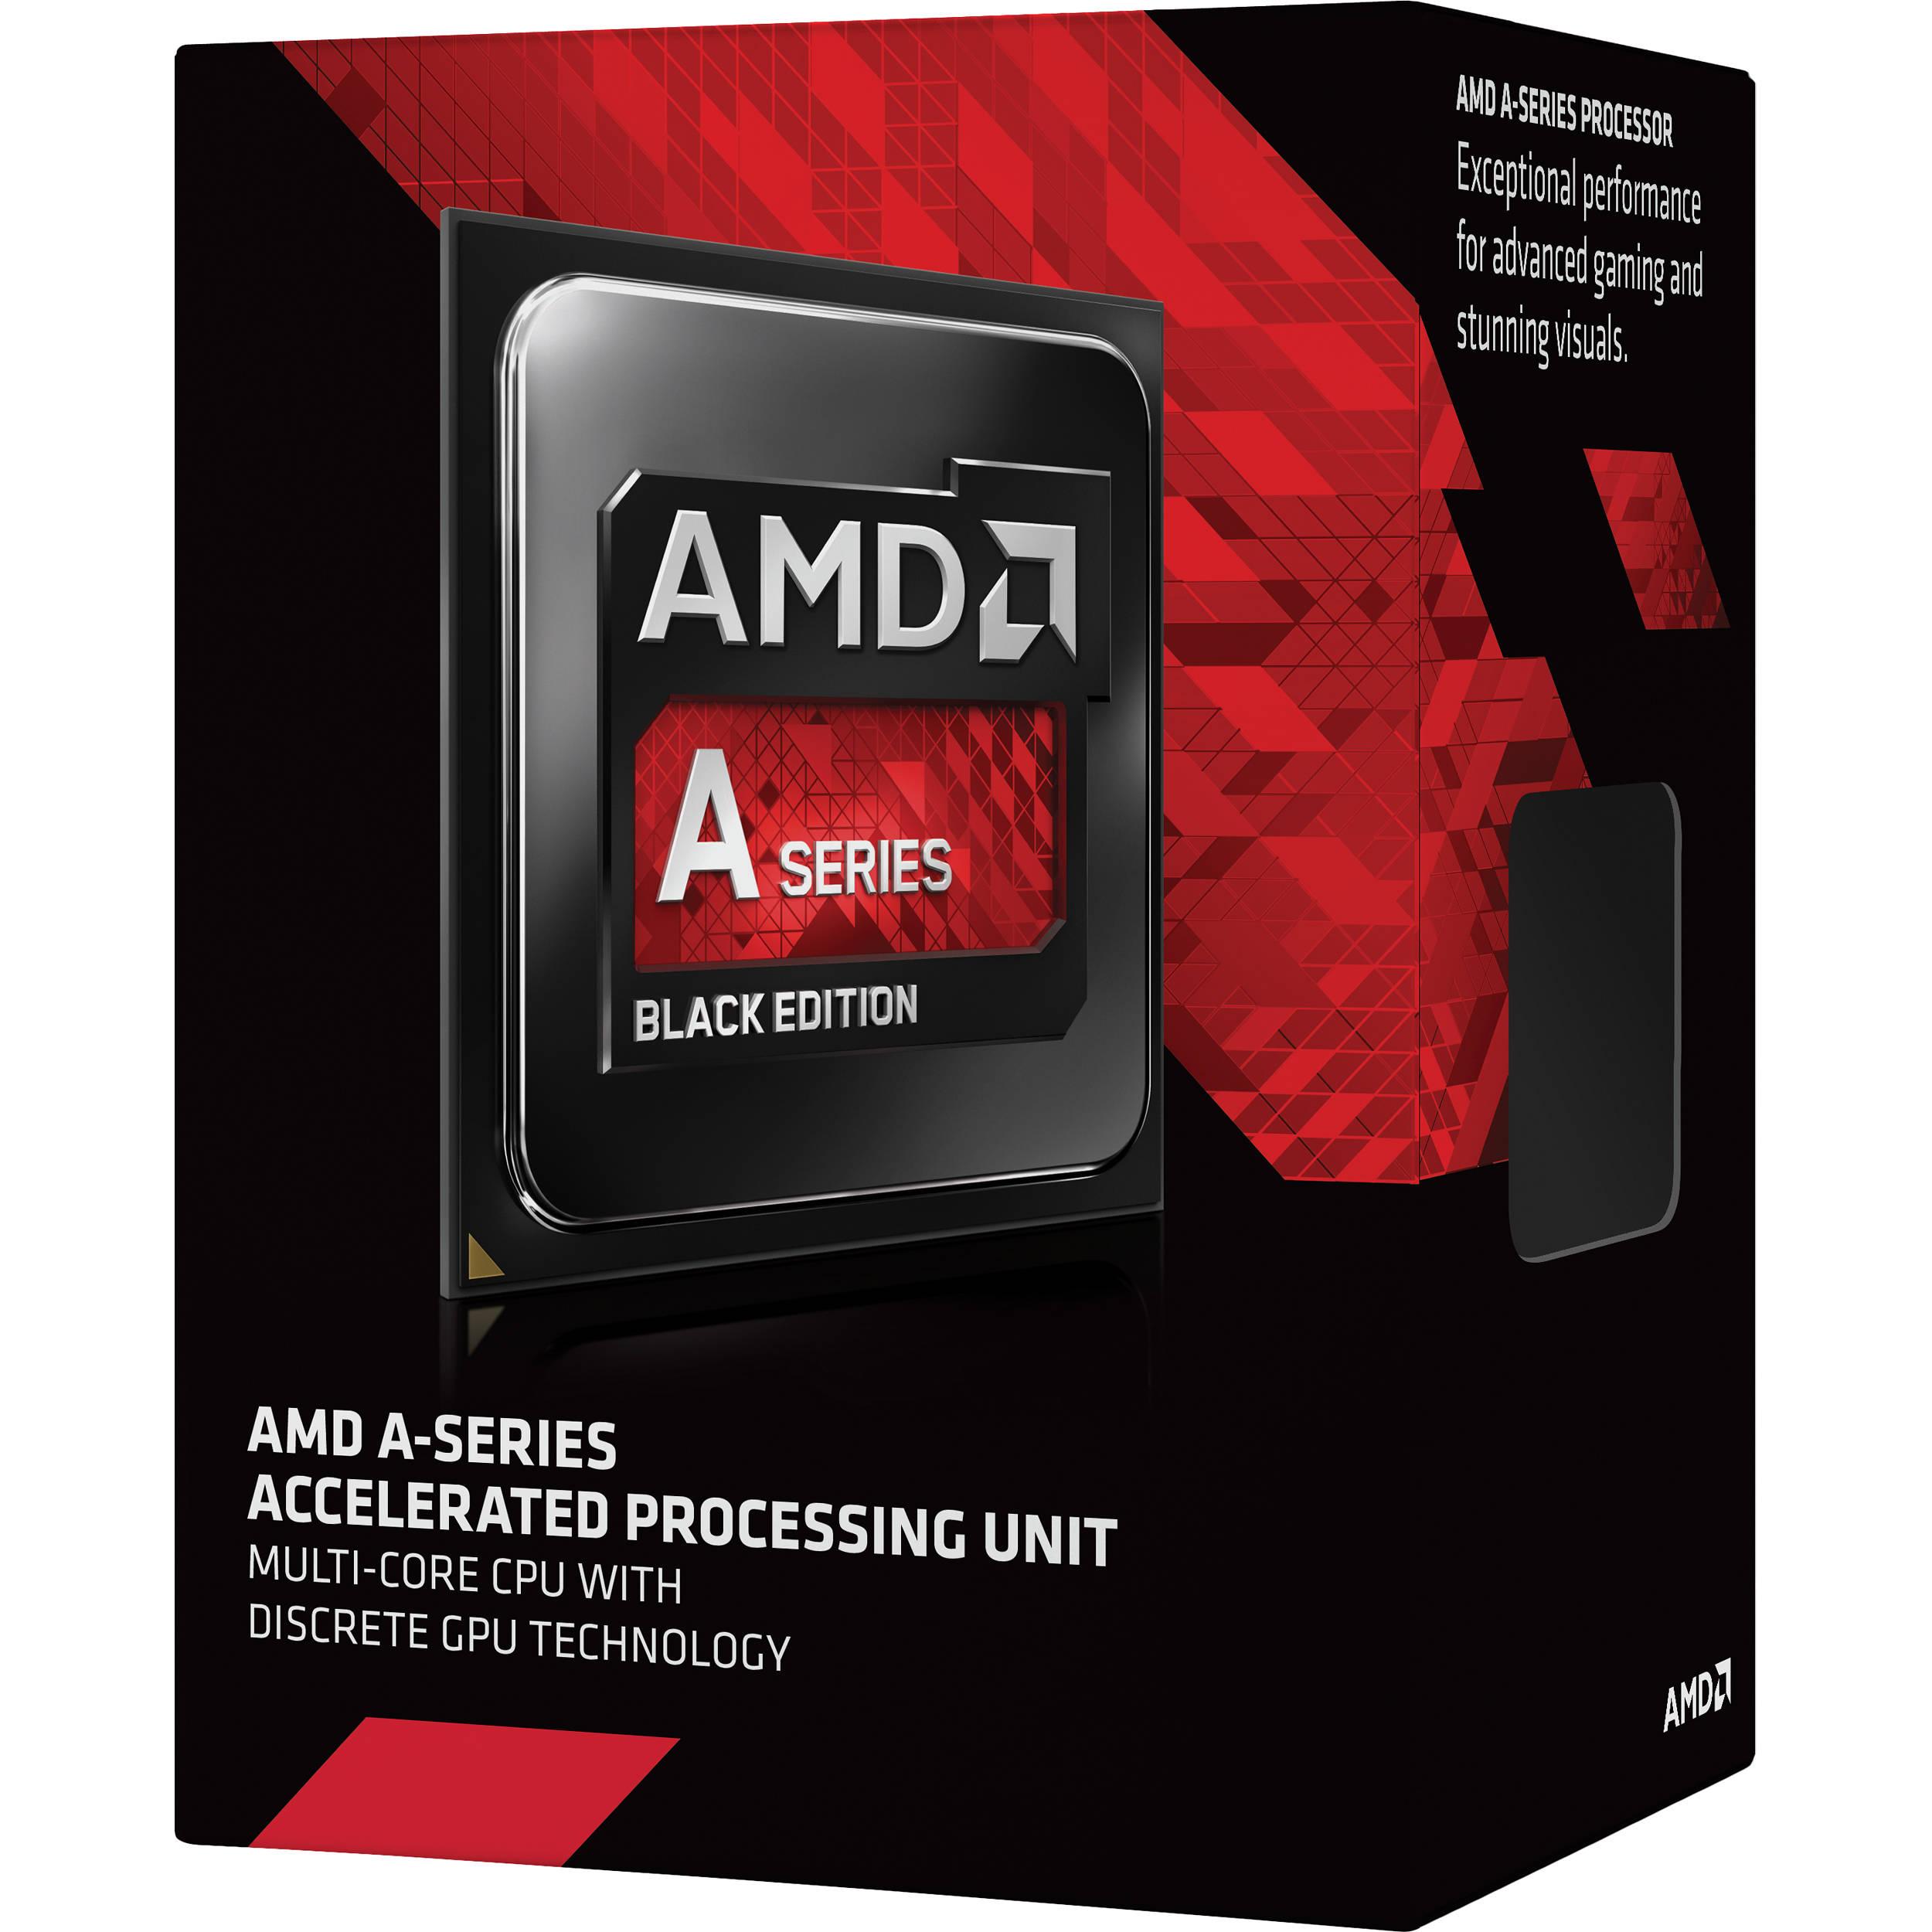 AMD RADEON HD 8670D WINDOWS 8 DRIVERS DOWNLOAD